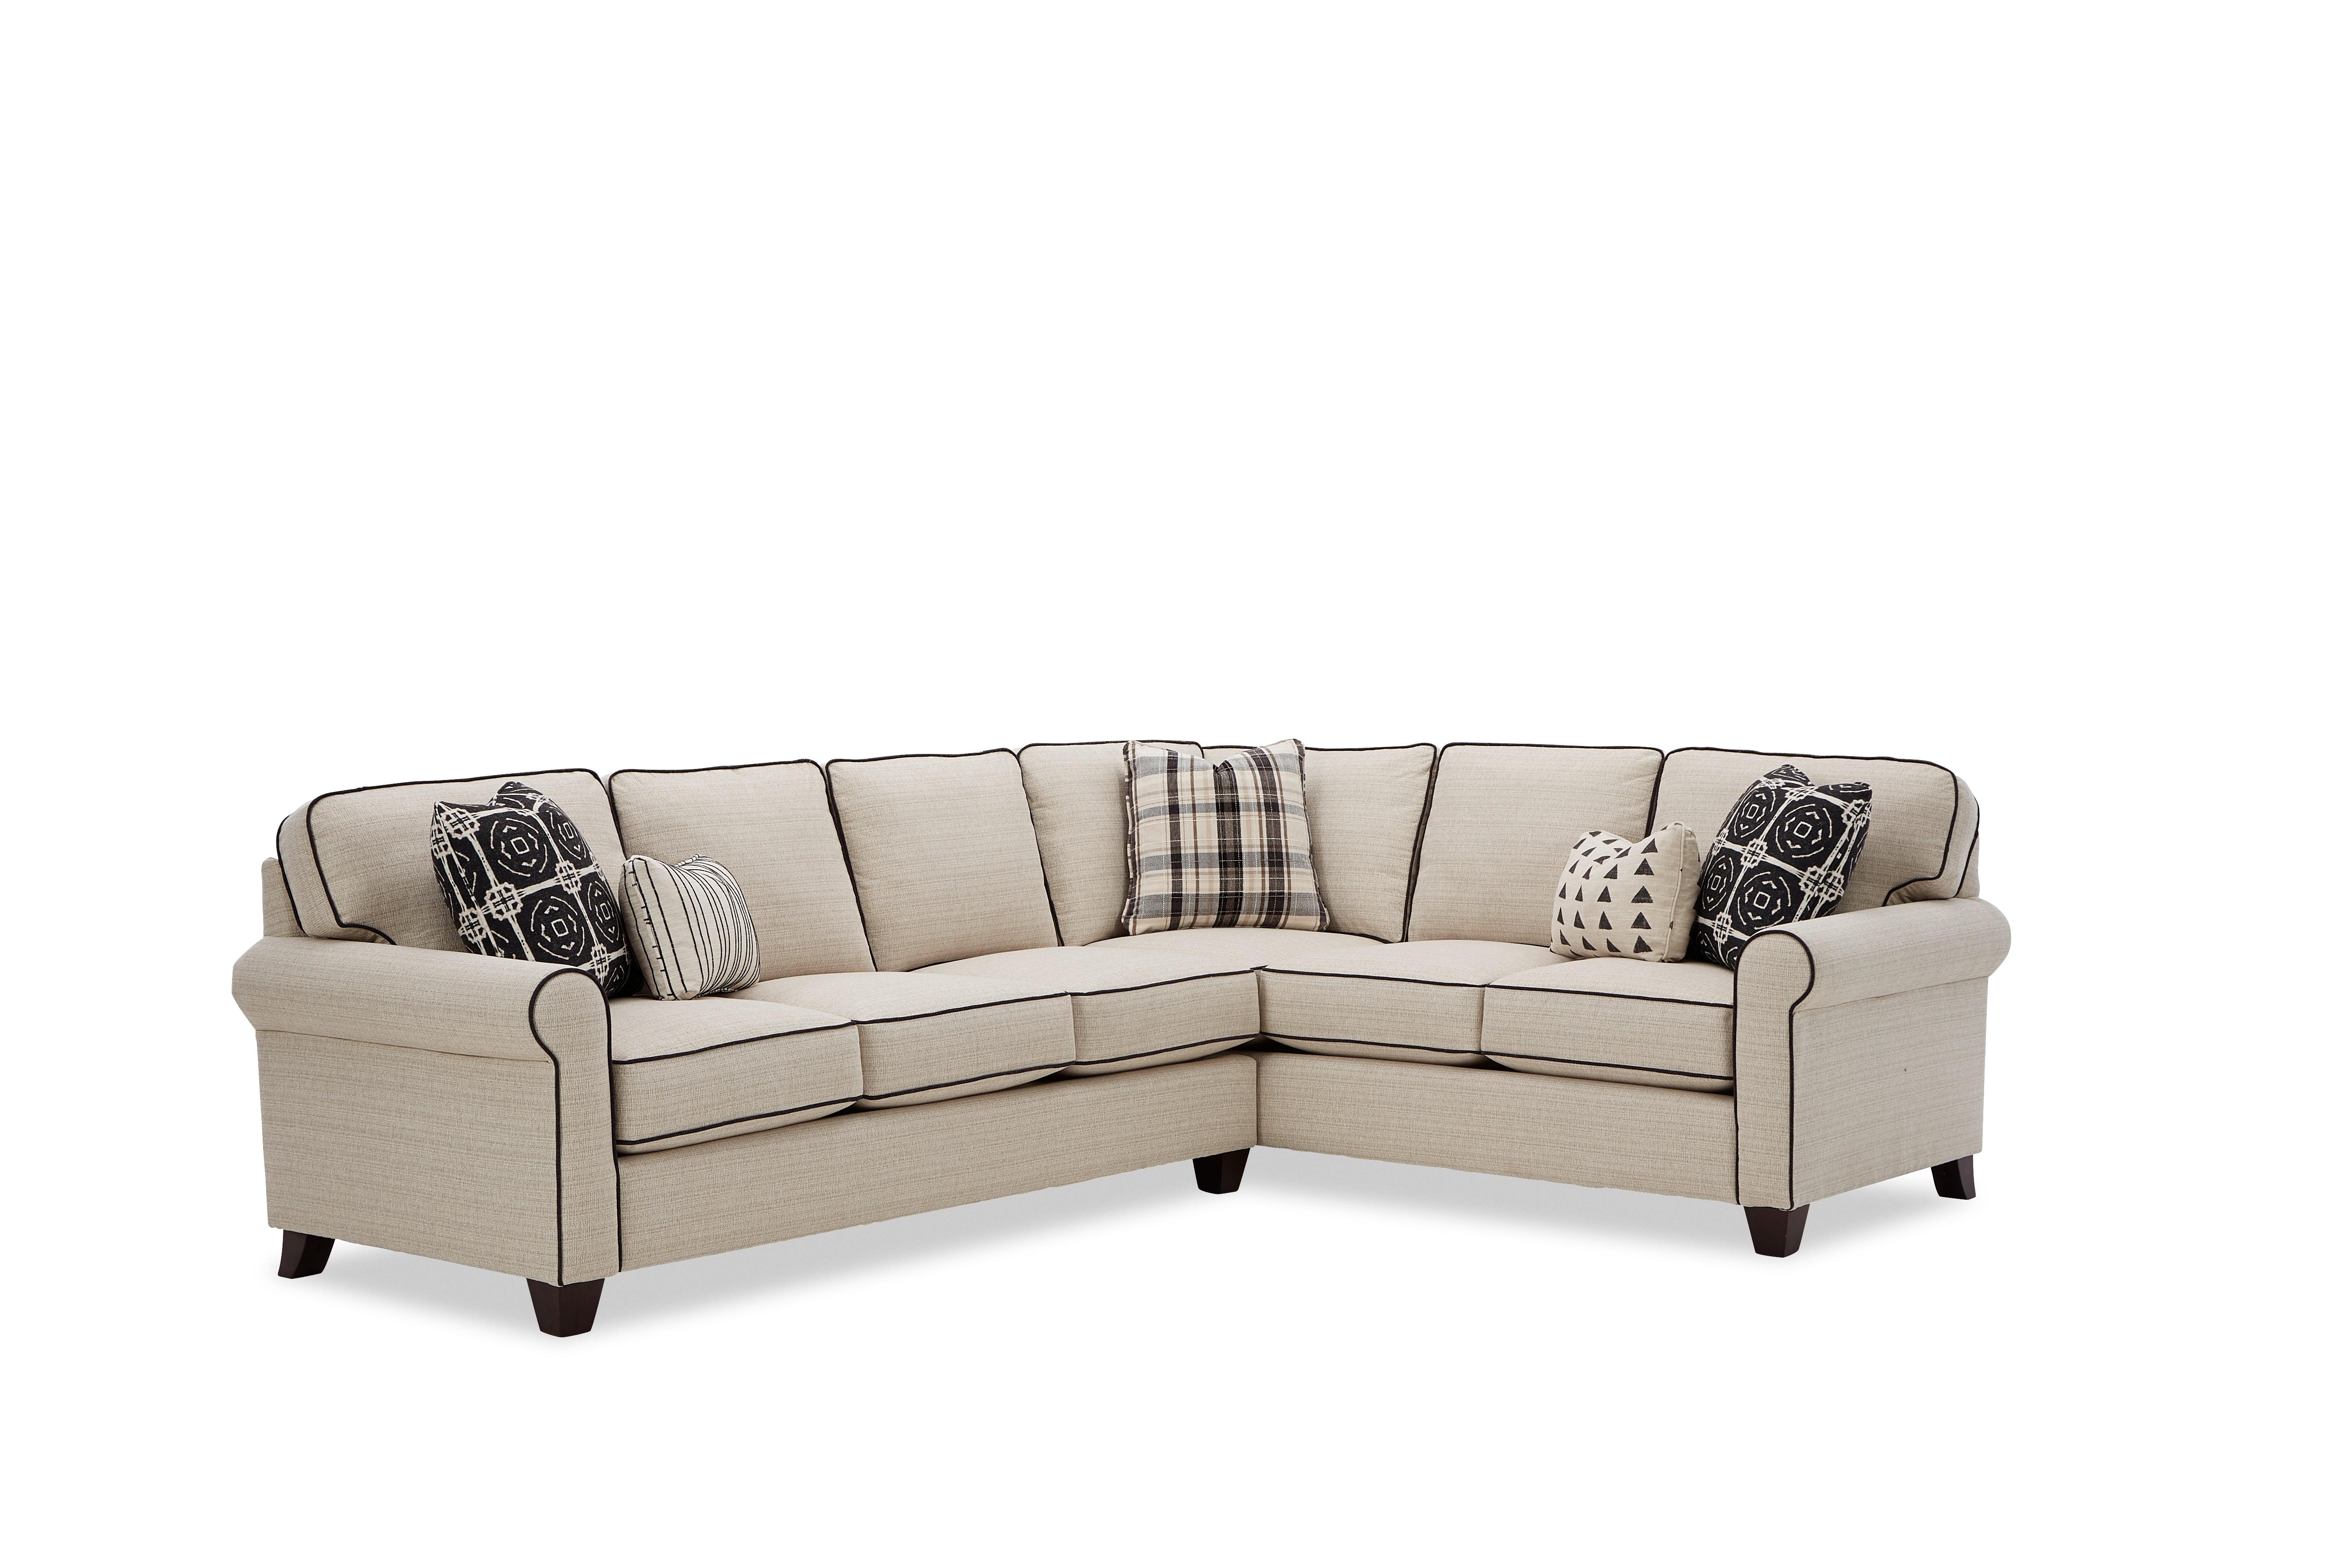 717450 5-Seat Sectional Sofa w/ RAF Return Sofa by Craftmaster at Esprit Decor Home Furnishings